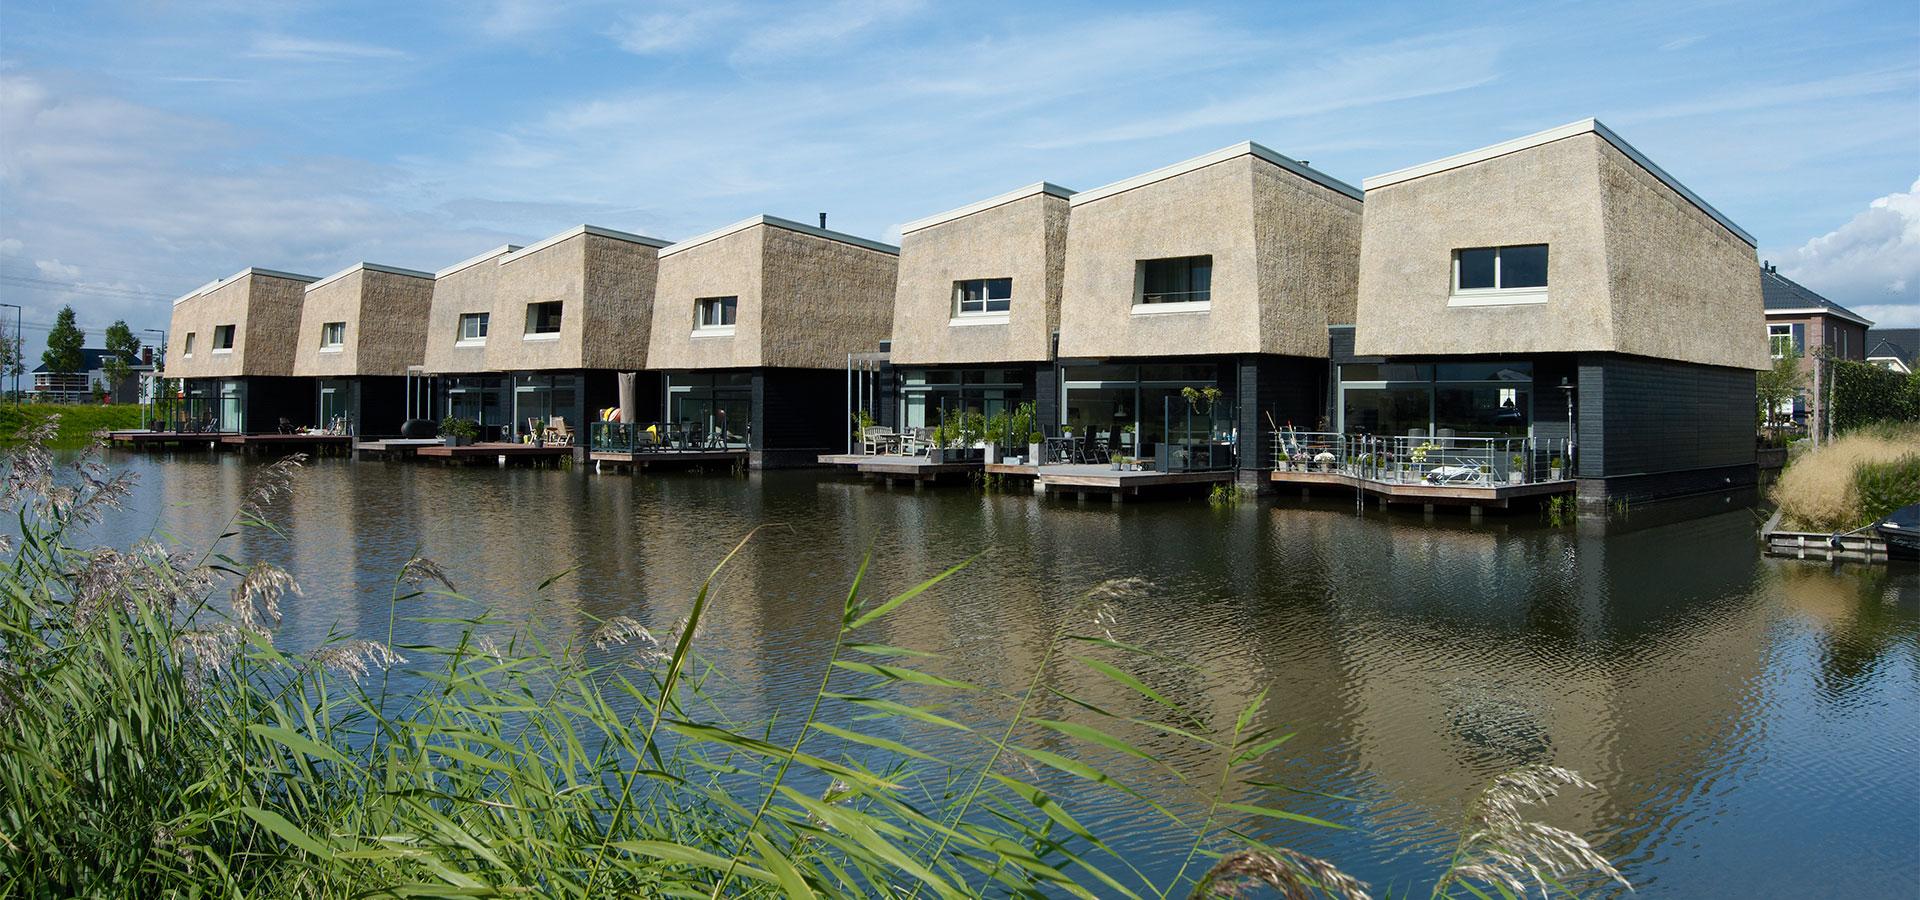 FARO architecten Waterwoningen Nesselande Rotterdam 04